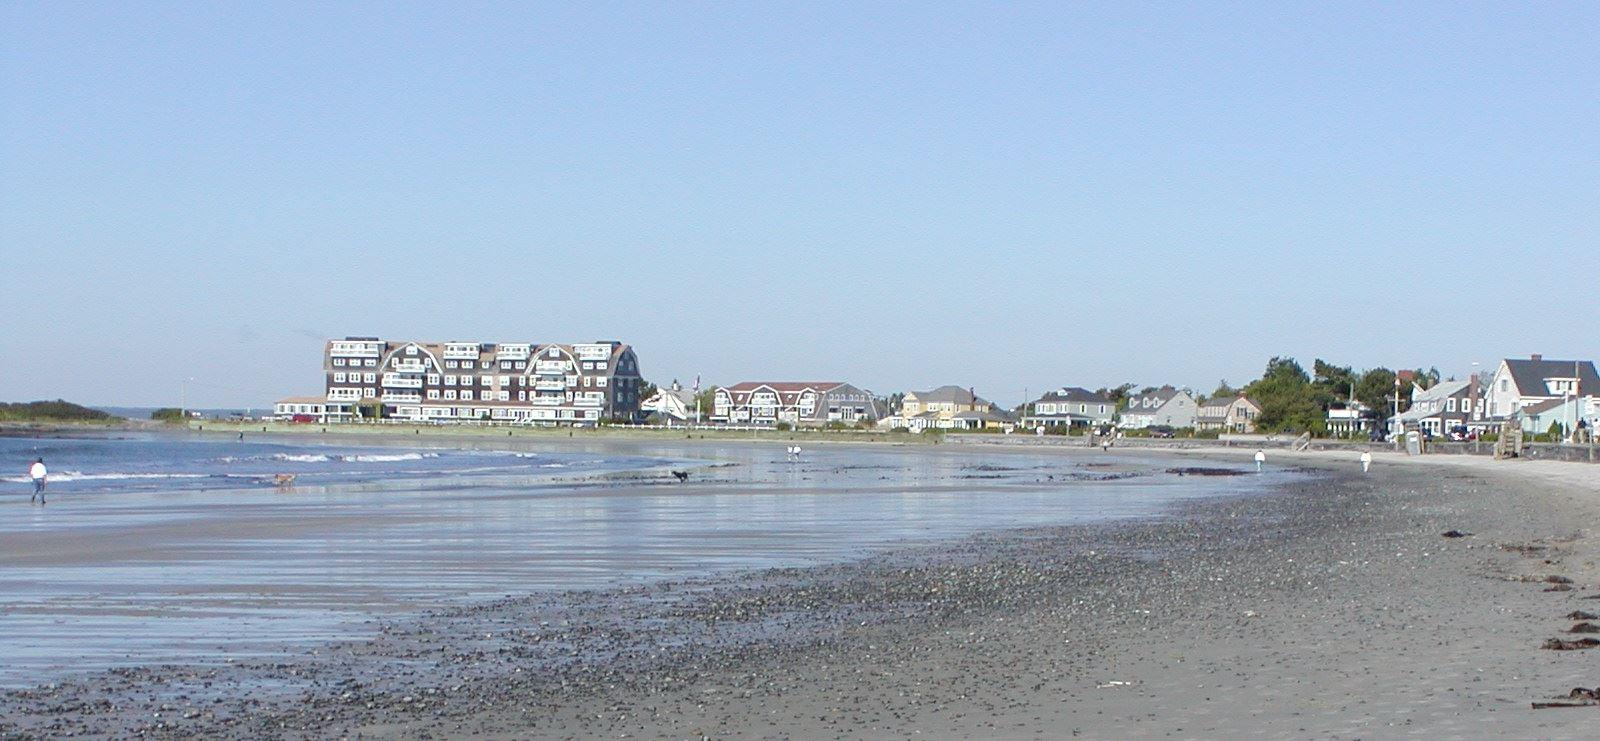 Gooch's Beach